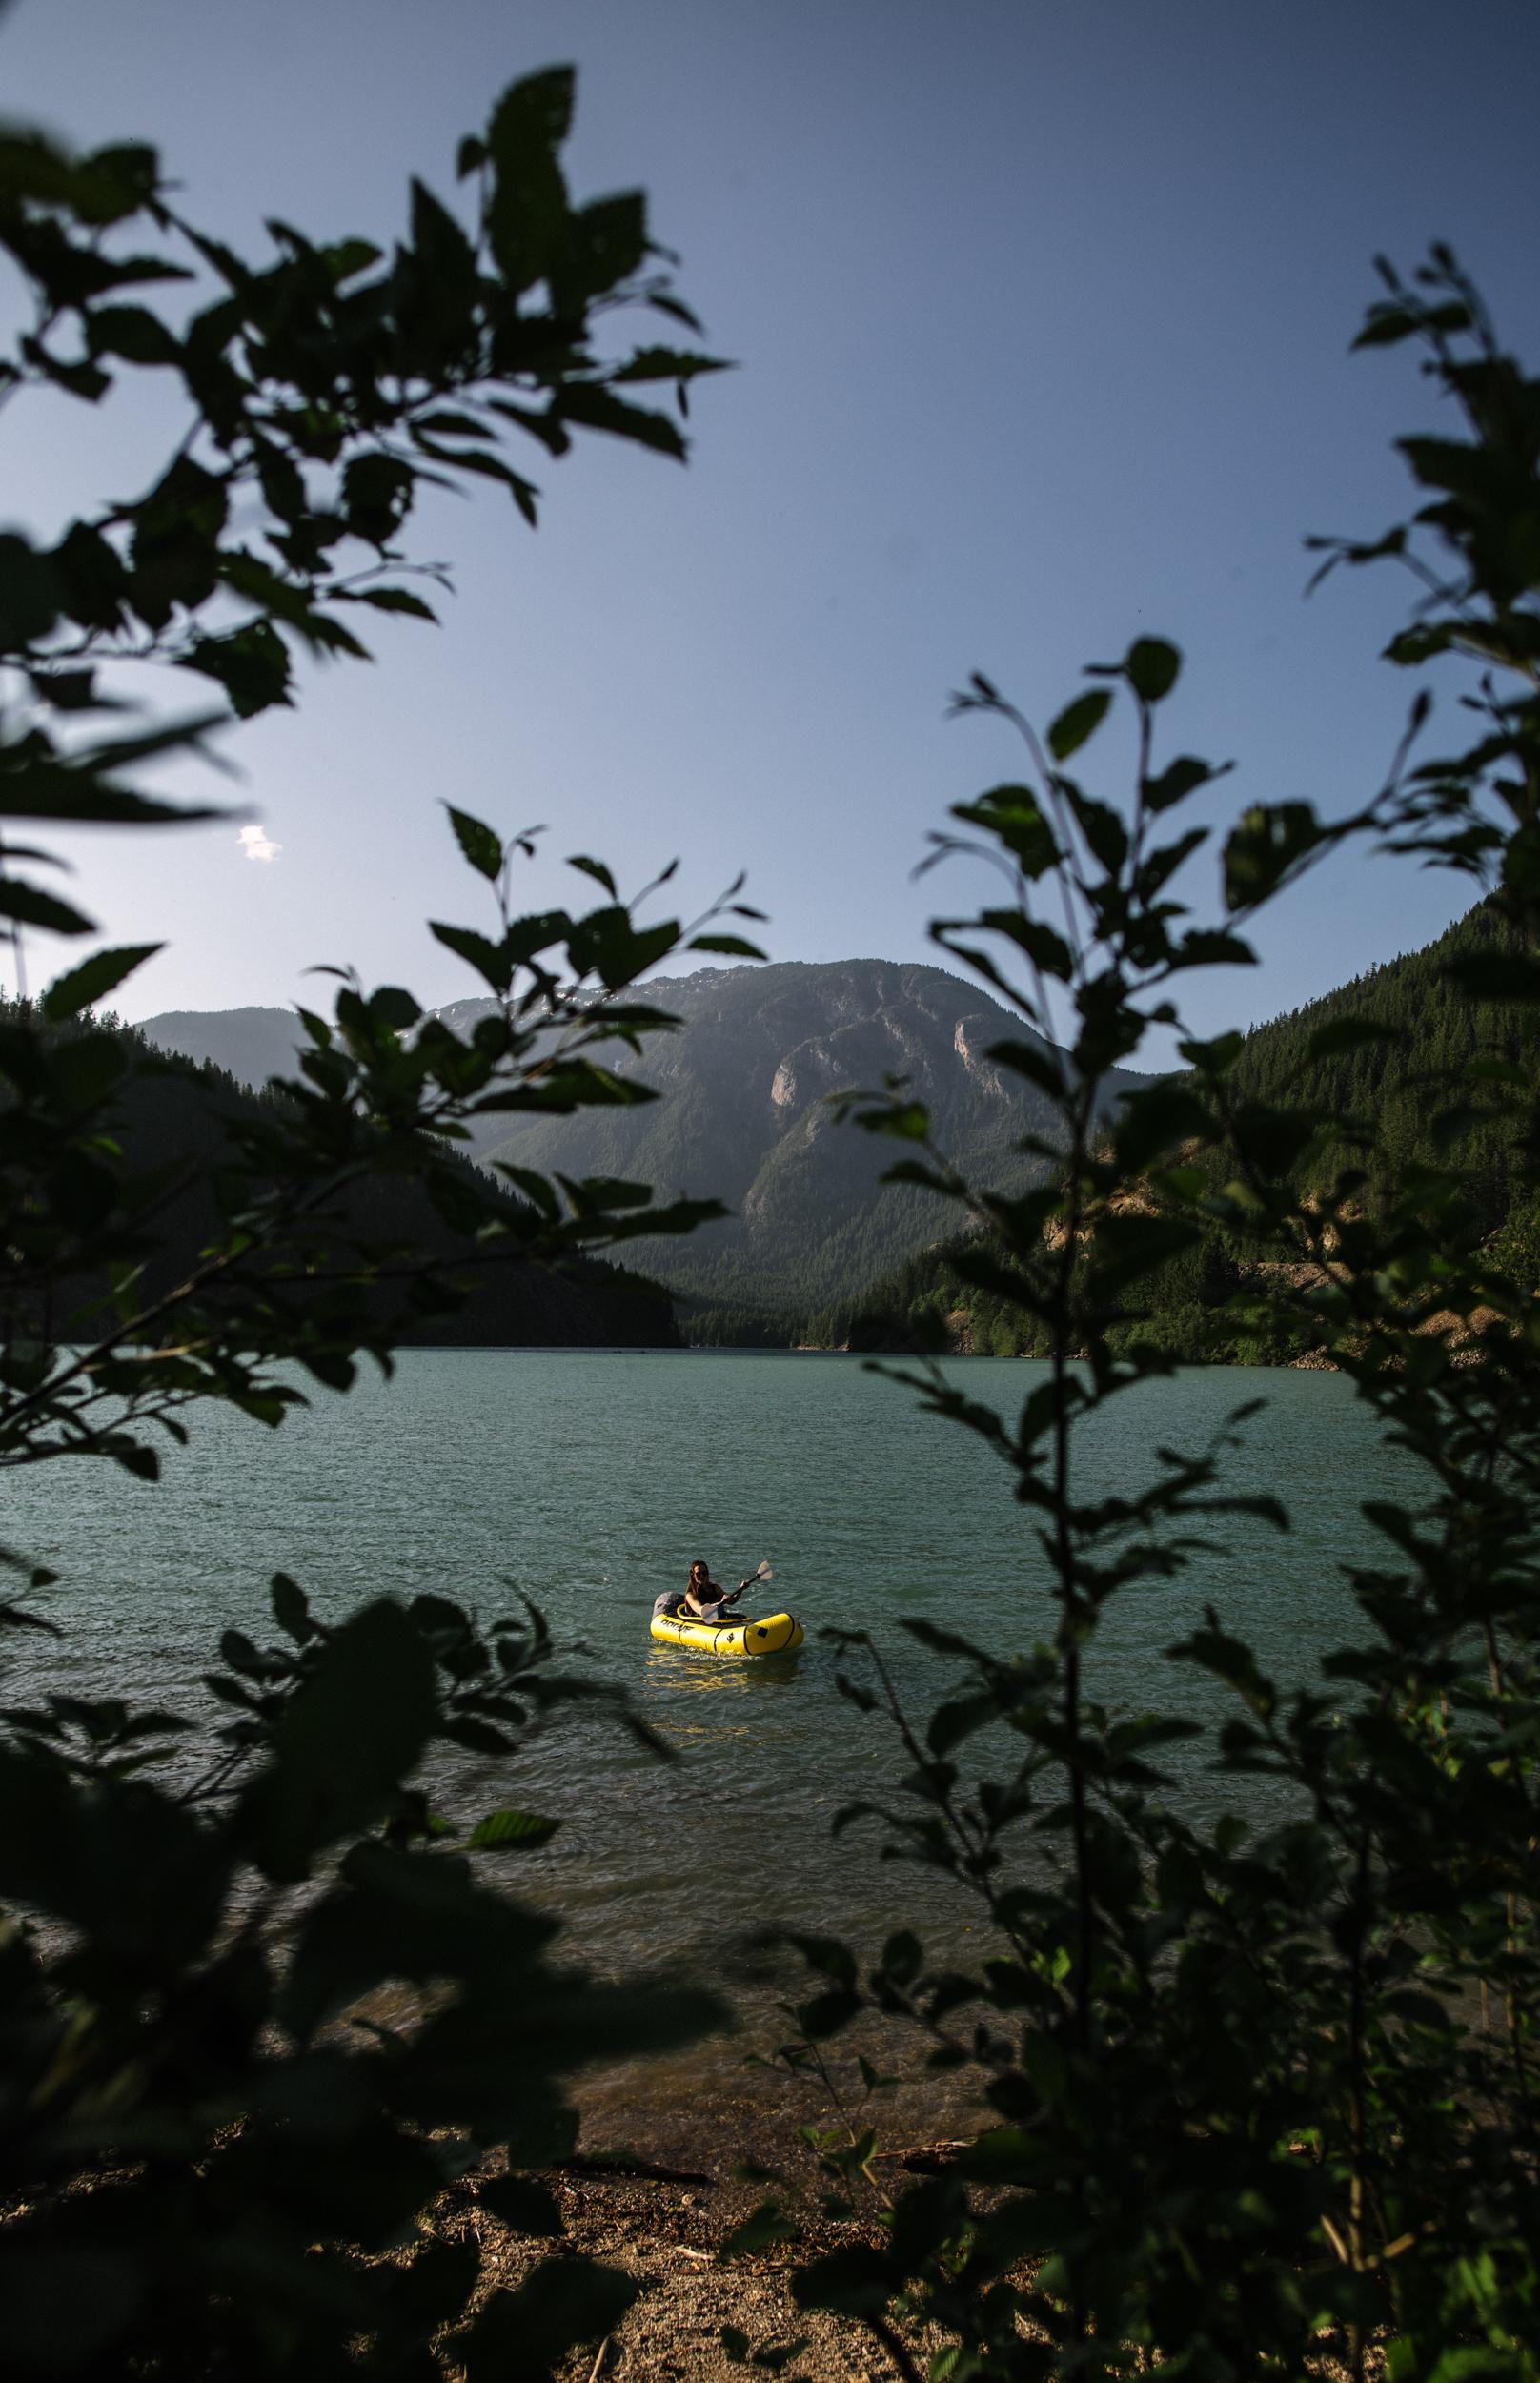 TannerWendellStewart_Brazil_Rogue_traveling_ocean_HighRes_1stPartyPrintDigital-88982.jpg